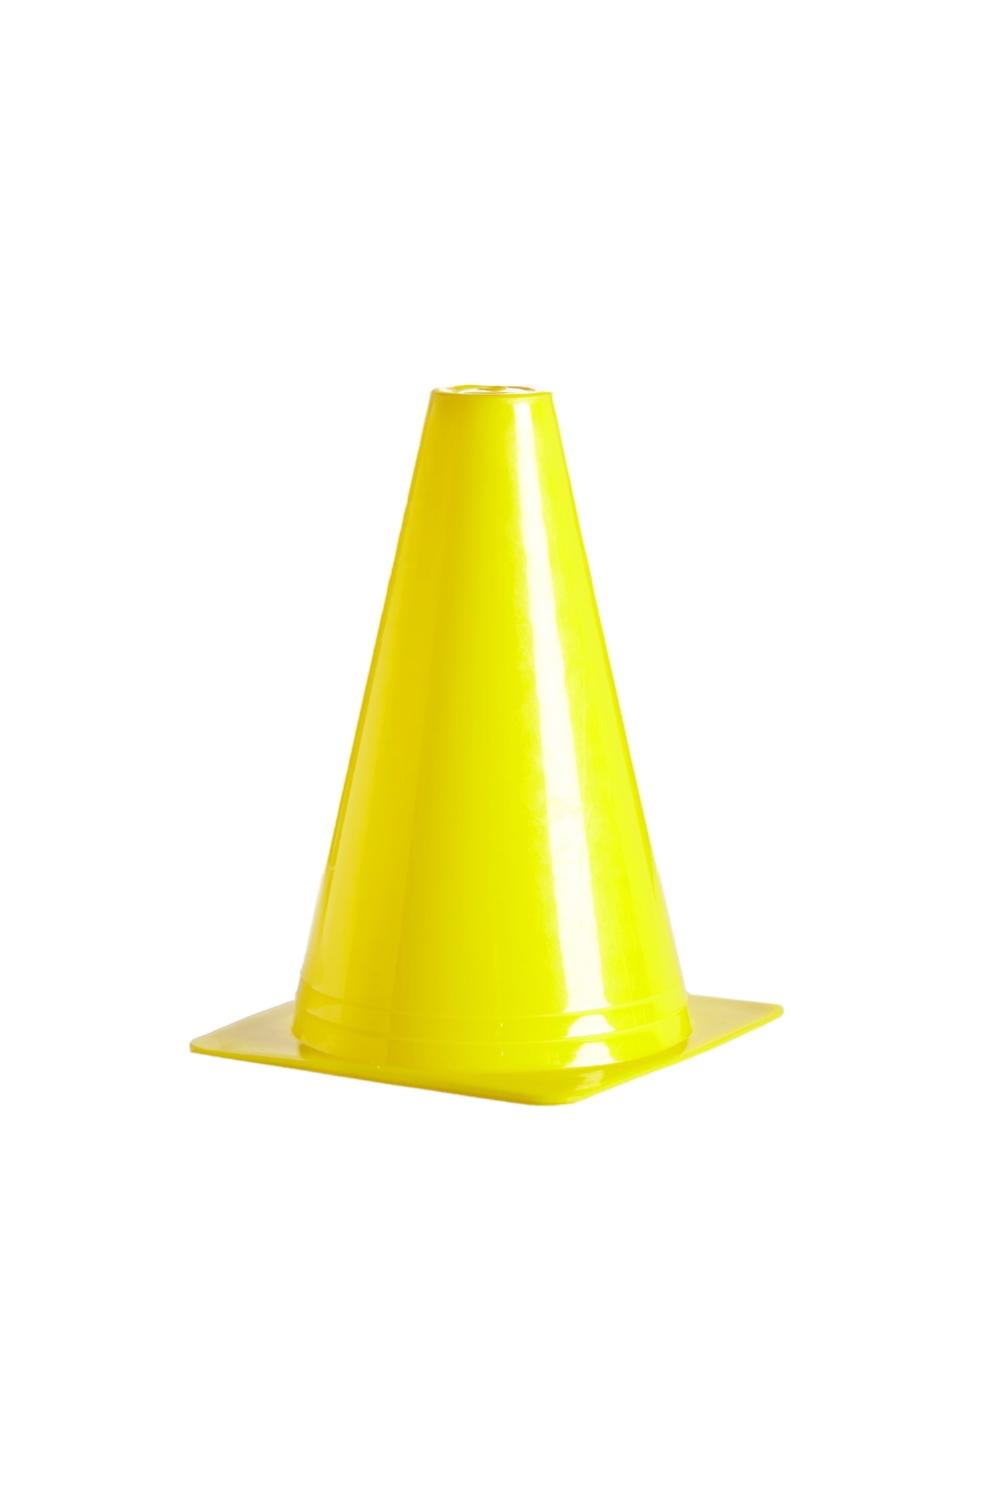 Tall Soccer Cone Yellow.jpg